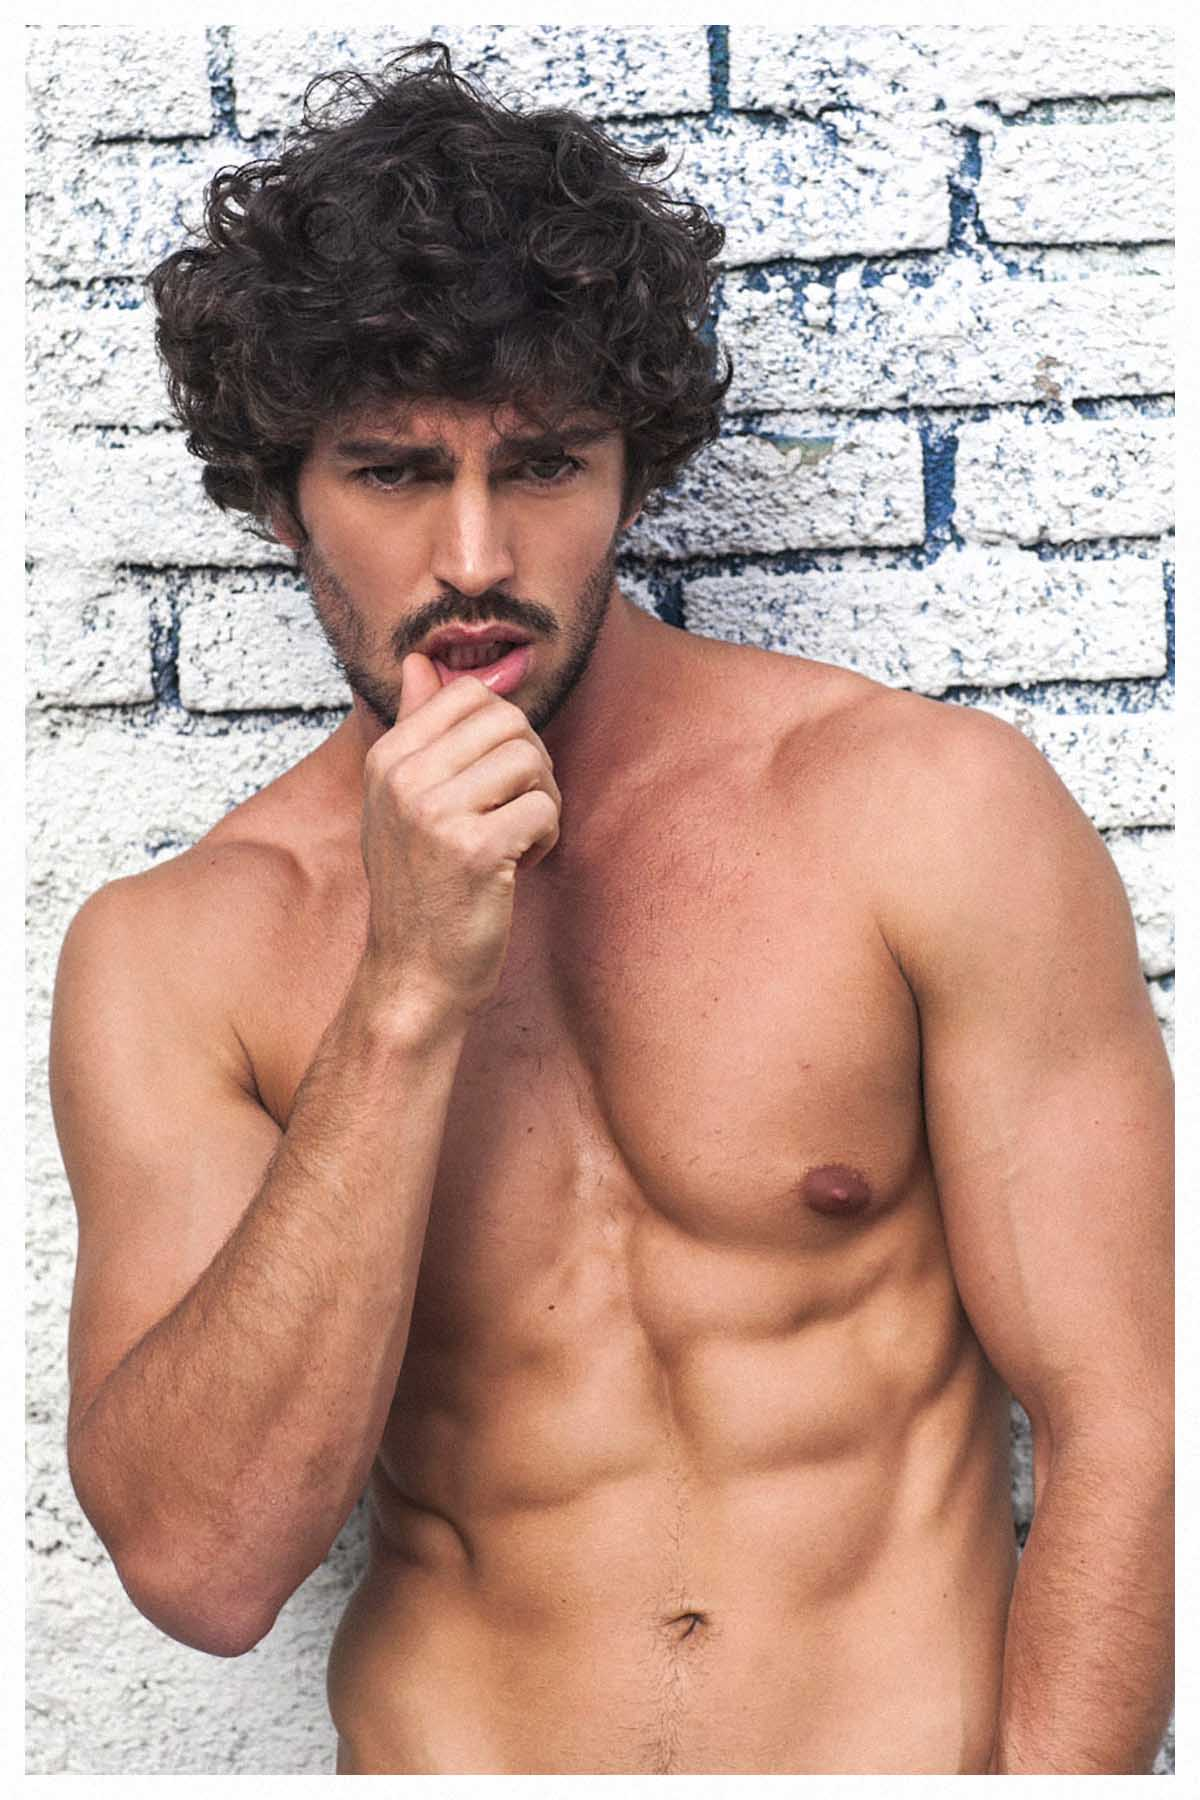 Brazil erotic male photography